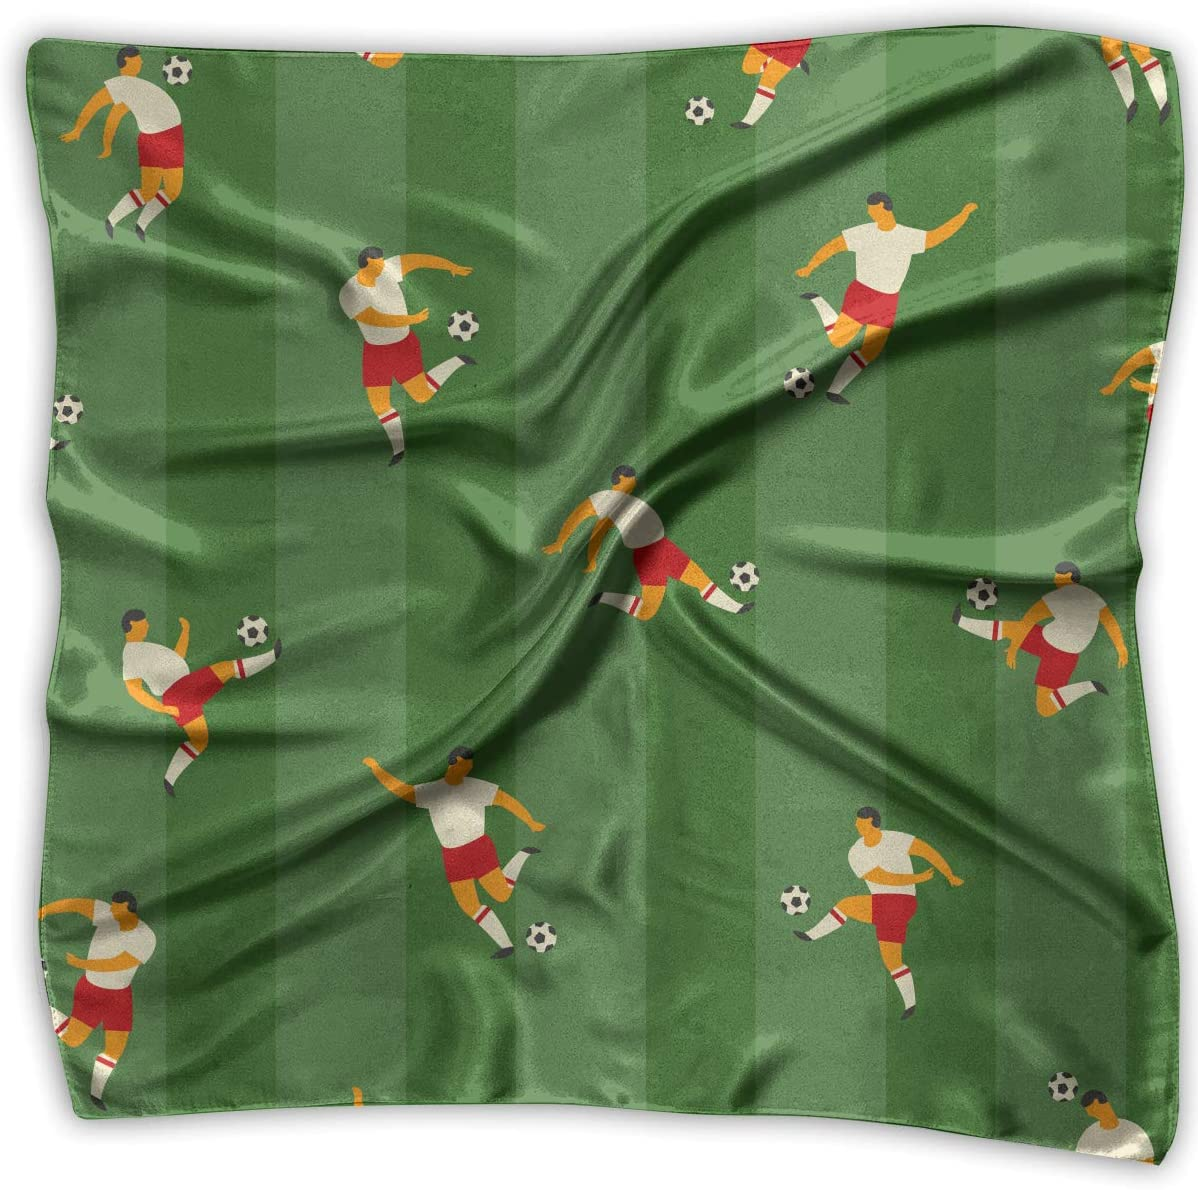 YANGZXC Cartoon Soccer Player Handkerchief Polyester Pocket Square Mulipurpose Silk Bandanas Delicate Printing